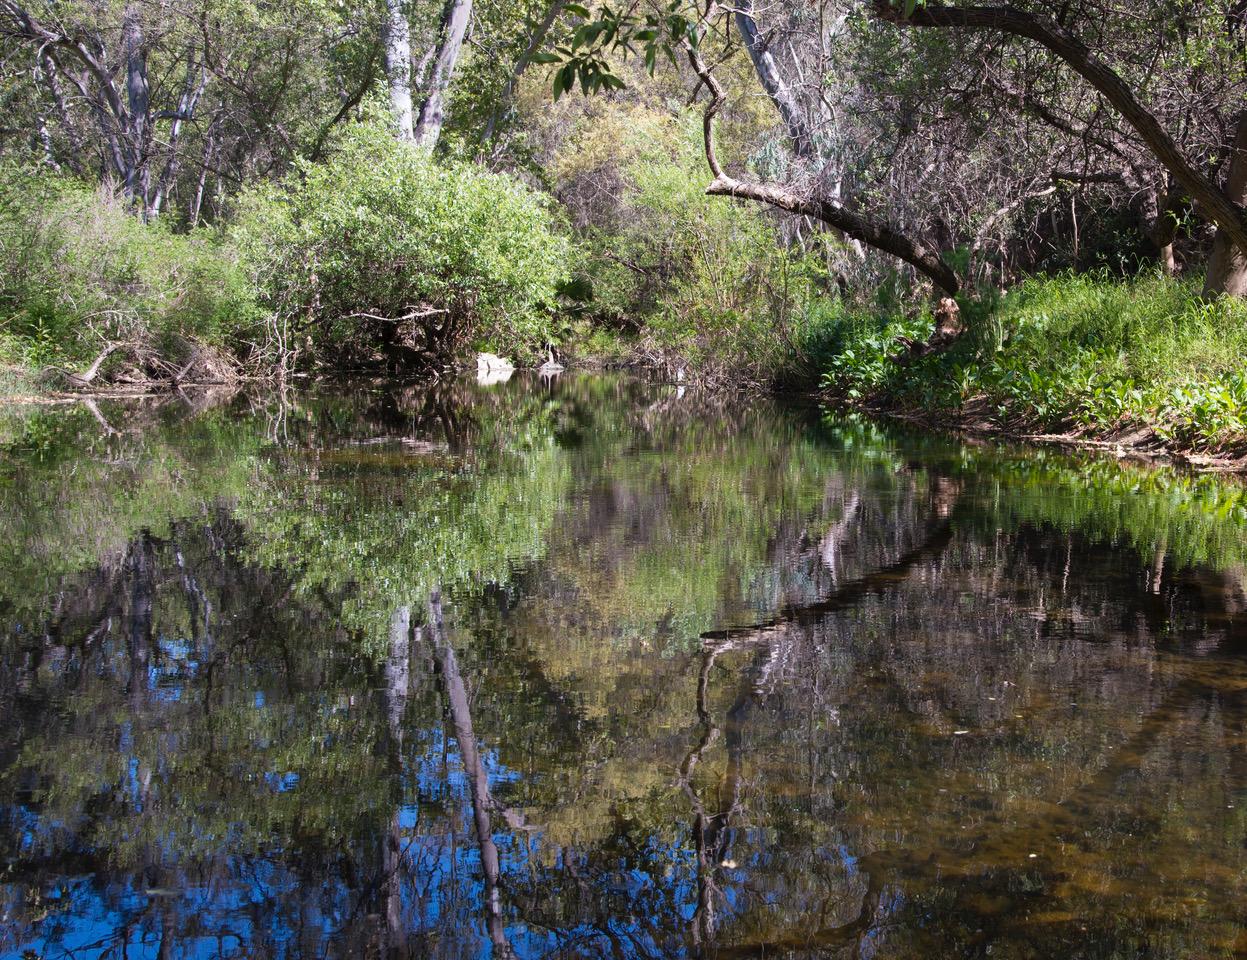 Photographs of Escondido Creek by Bill Dewey